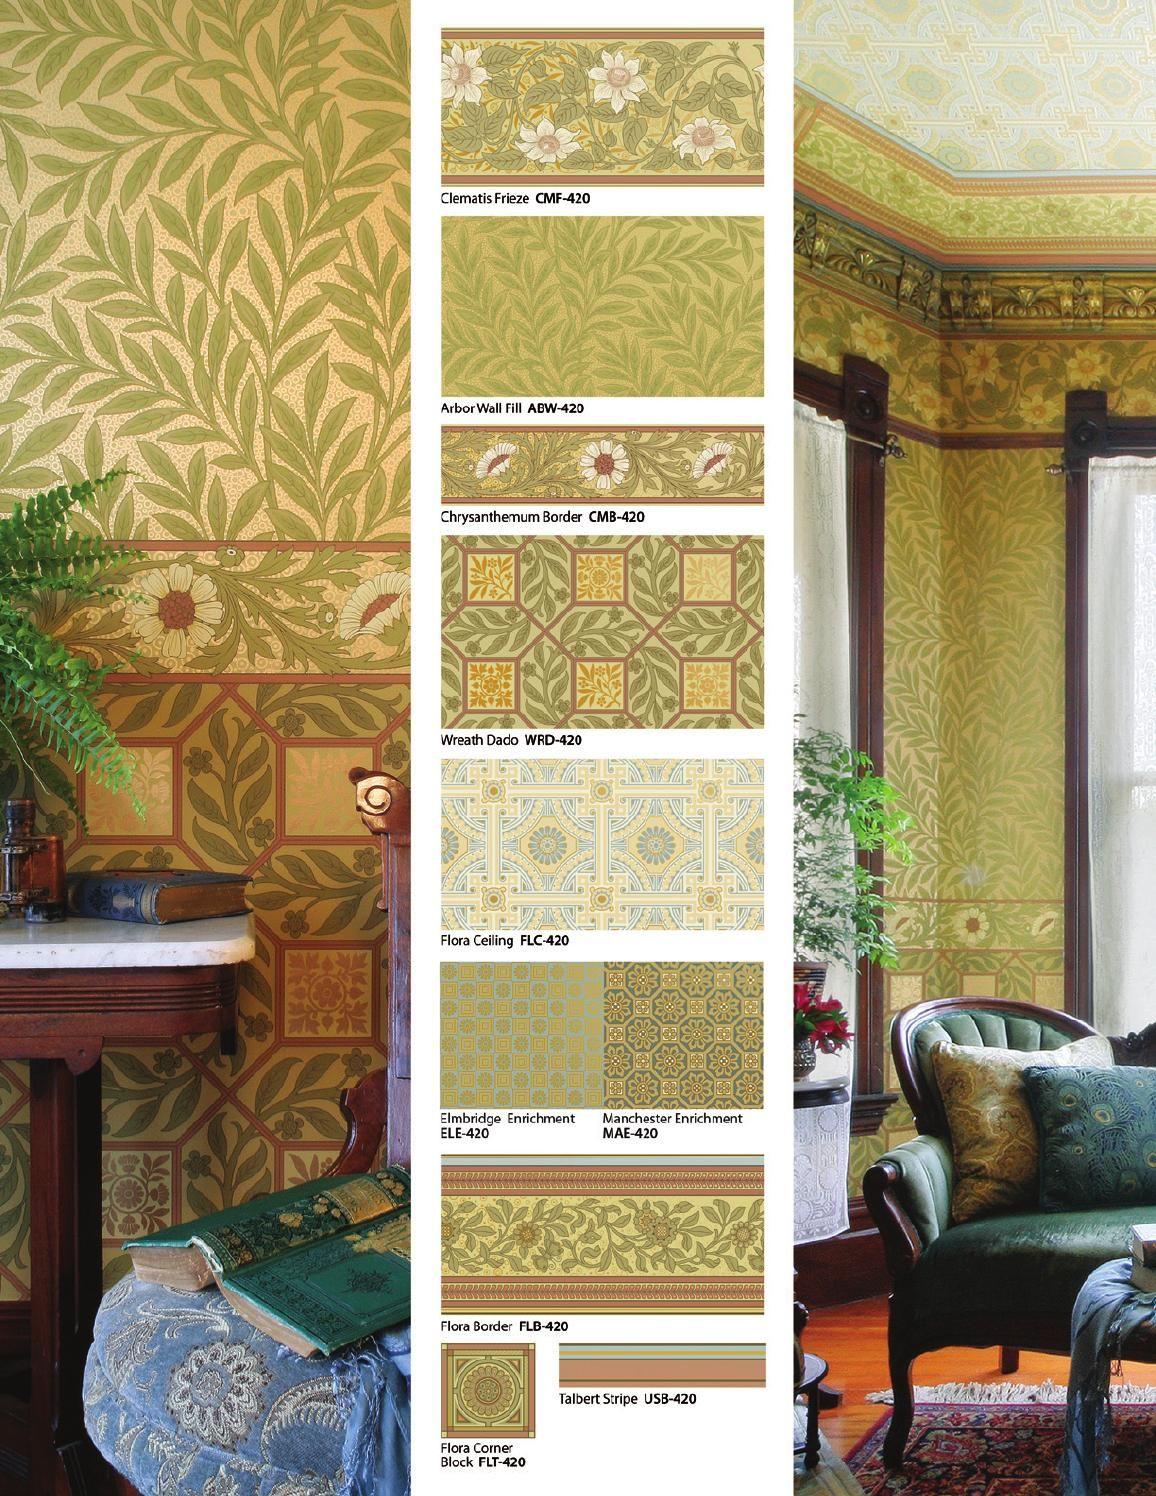 B J Talbert Wallpaper Collection Wallpaper Victorian Interiors Craftsman Style Textiles